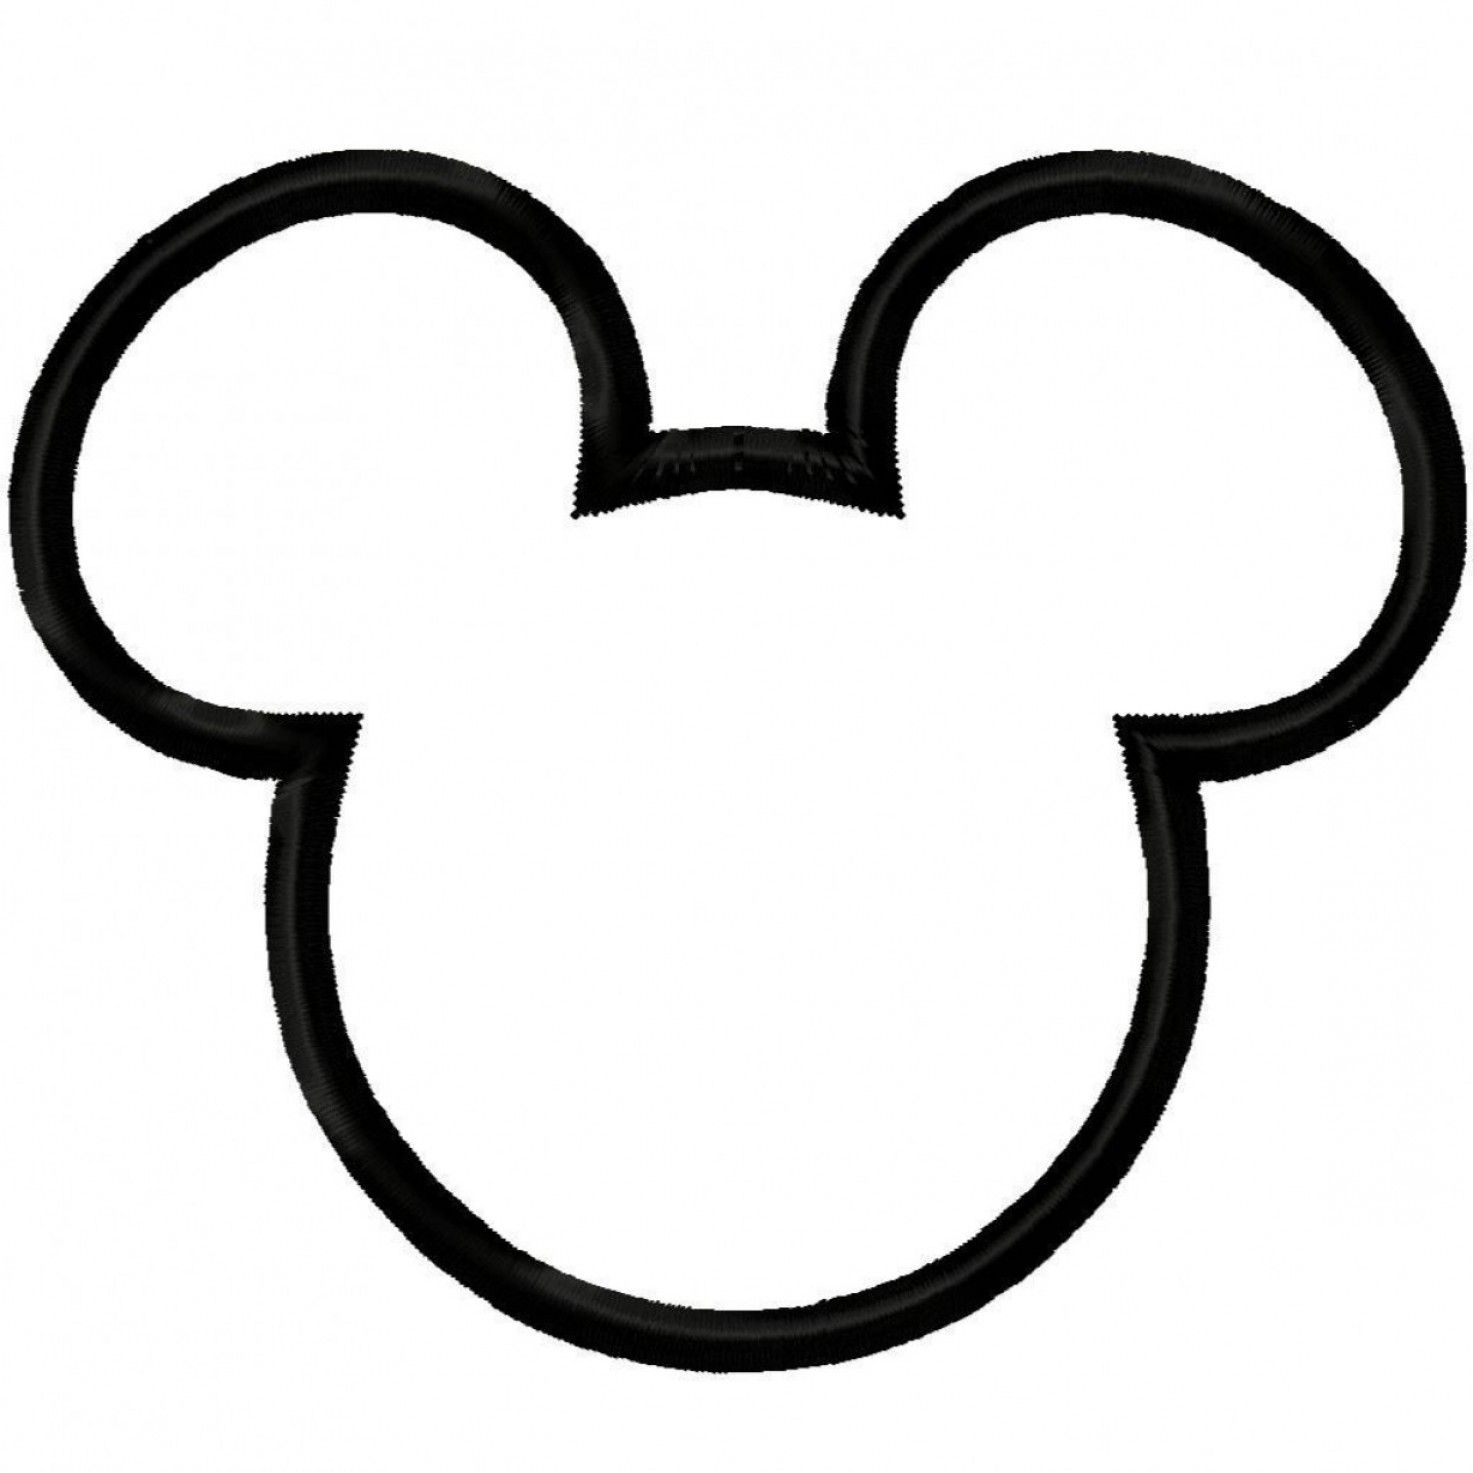 Mickey Vector Mickey Mouse Ears Clipart Black And White Mickey Mouse Silhouette Mickey Mouse Template Mickey Mouse Head